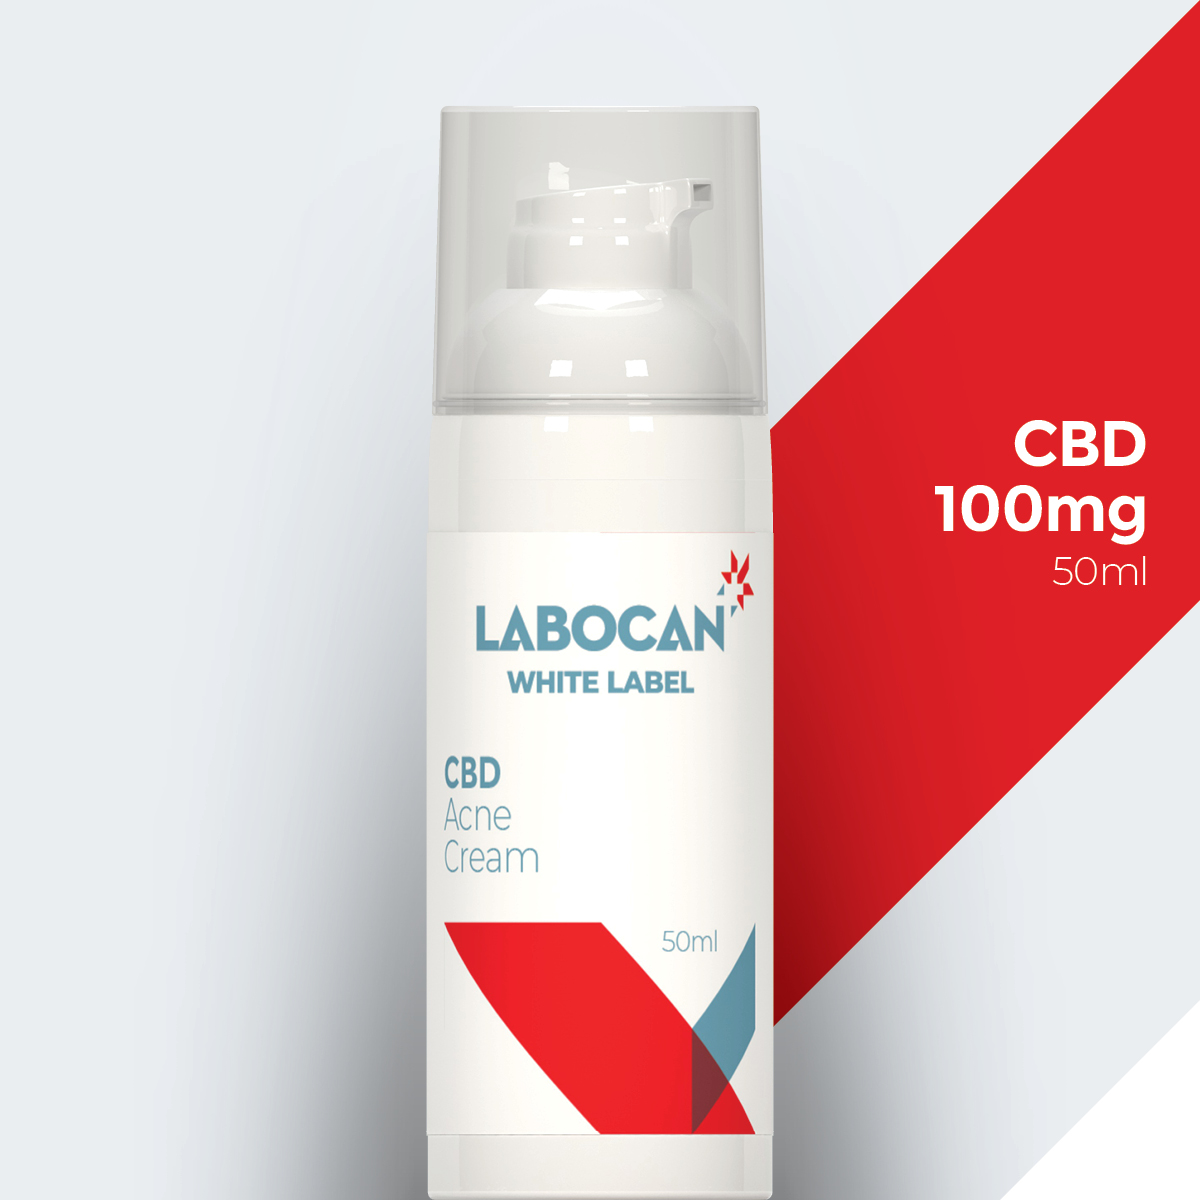 Labocan Crema per l'acne al CBD etichetta bianca